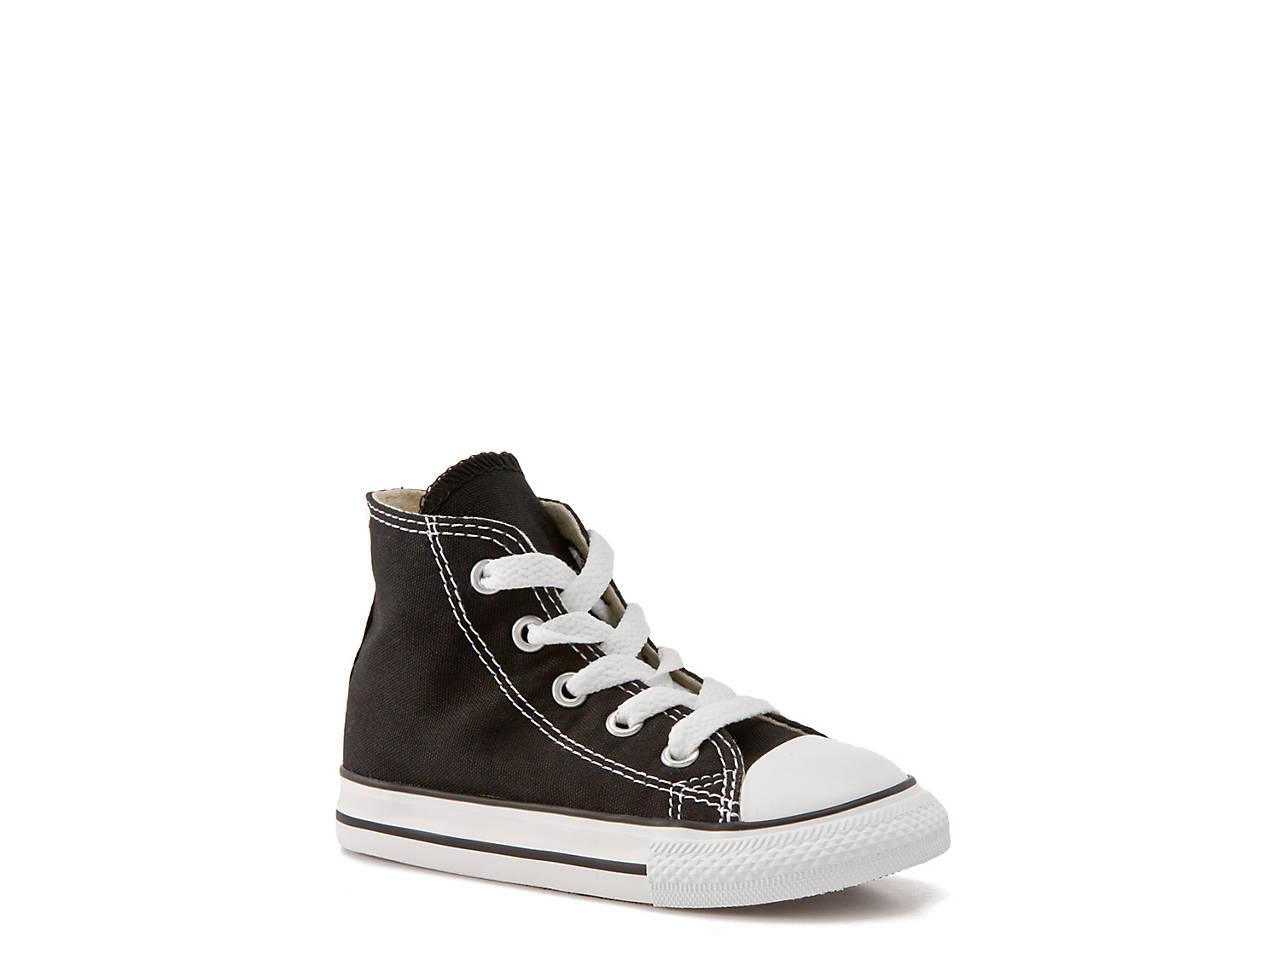 ef4ecc1841caf Chuck Taylor All Star High-Top Sneaker - Kids'